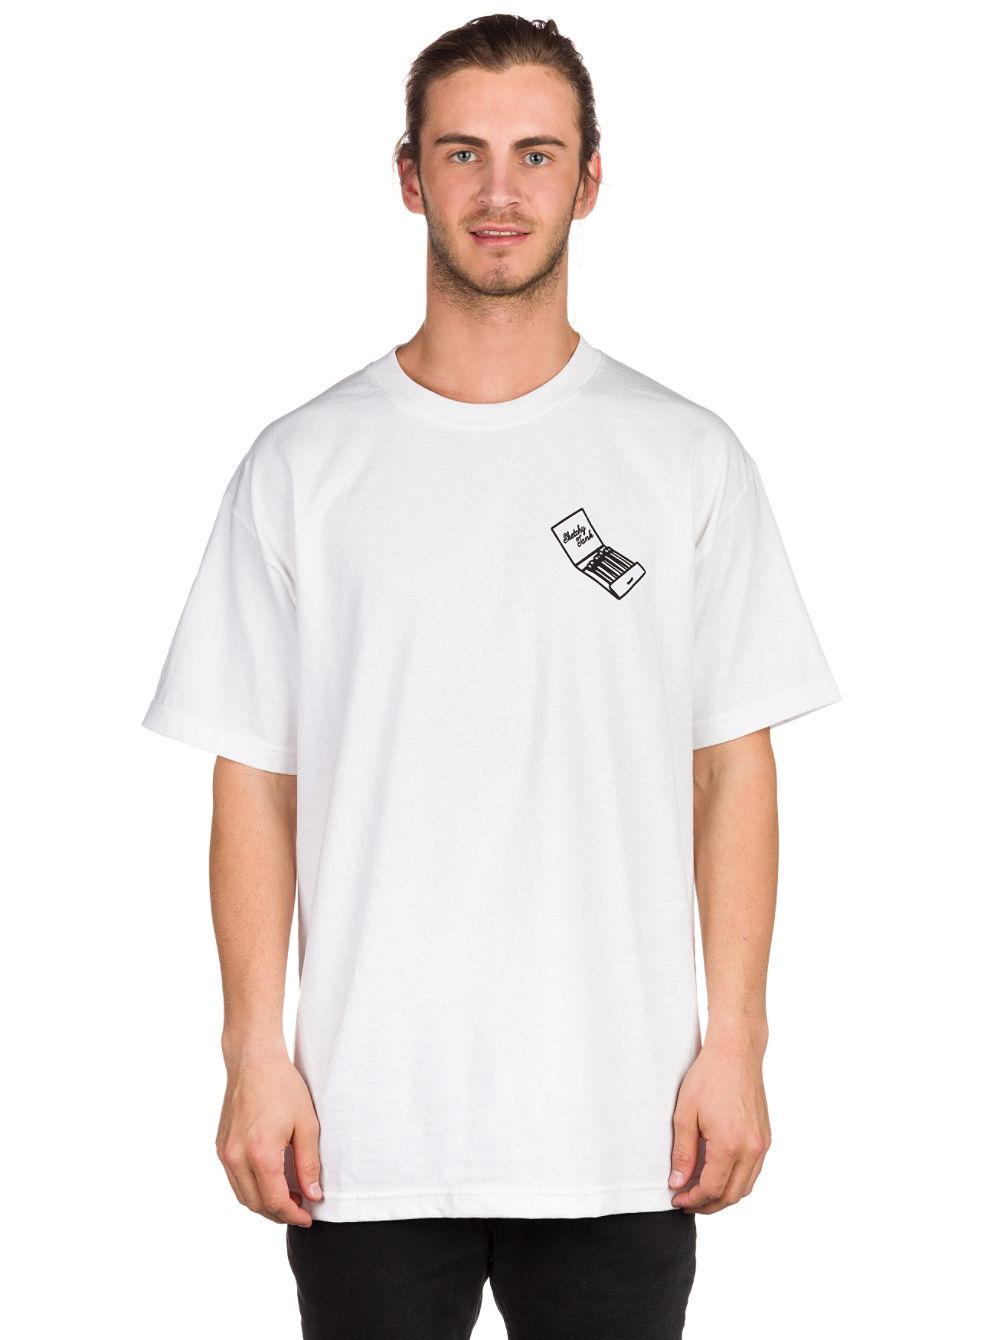 sketchy-tank-bartender-t-shirt